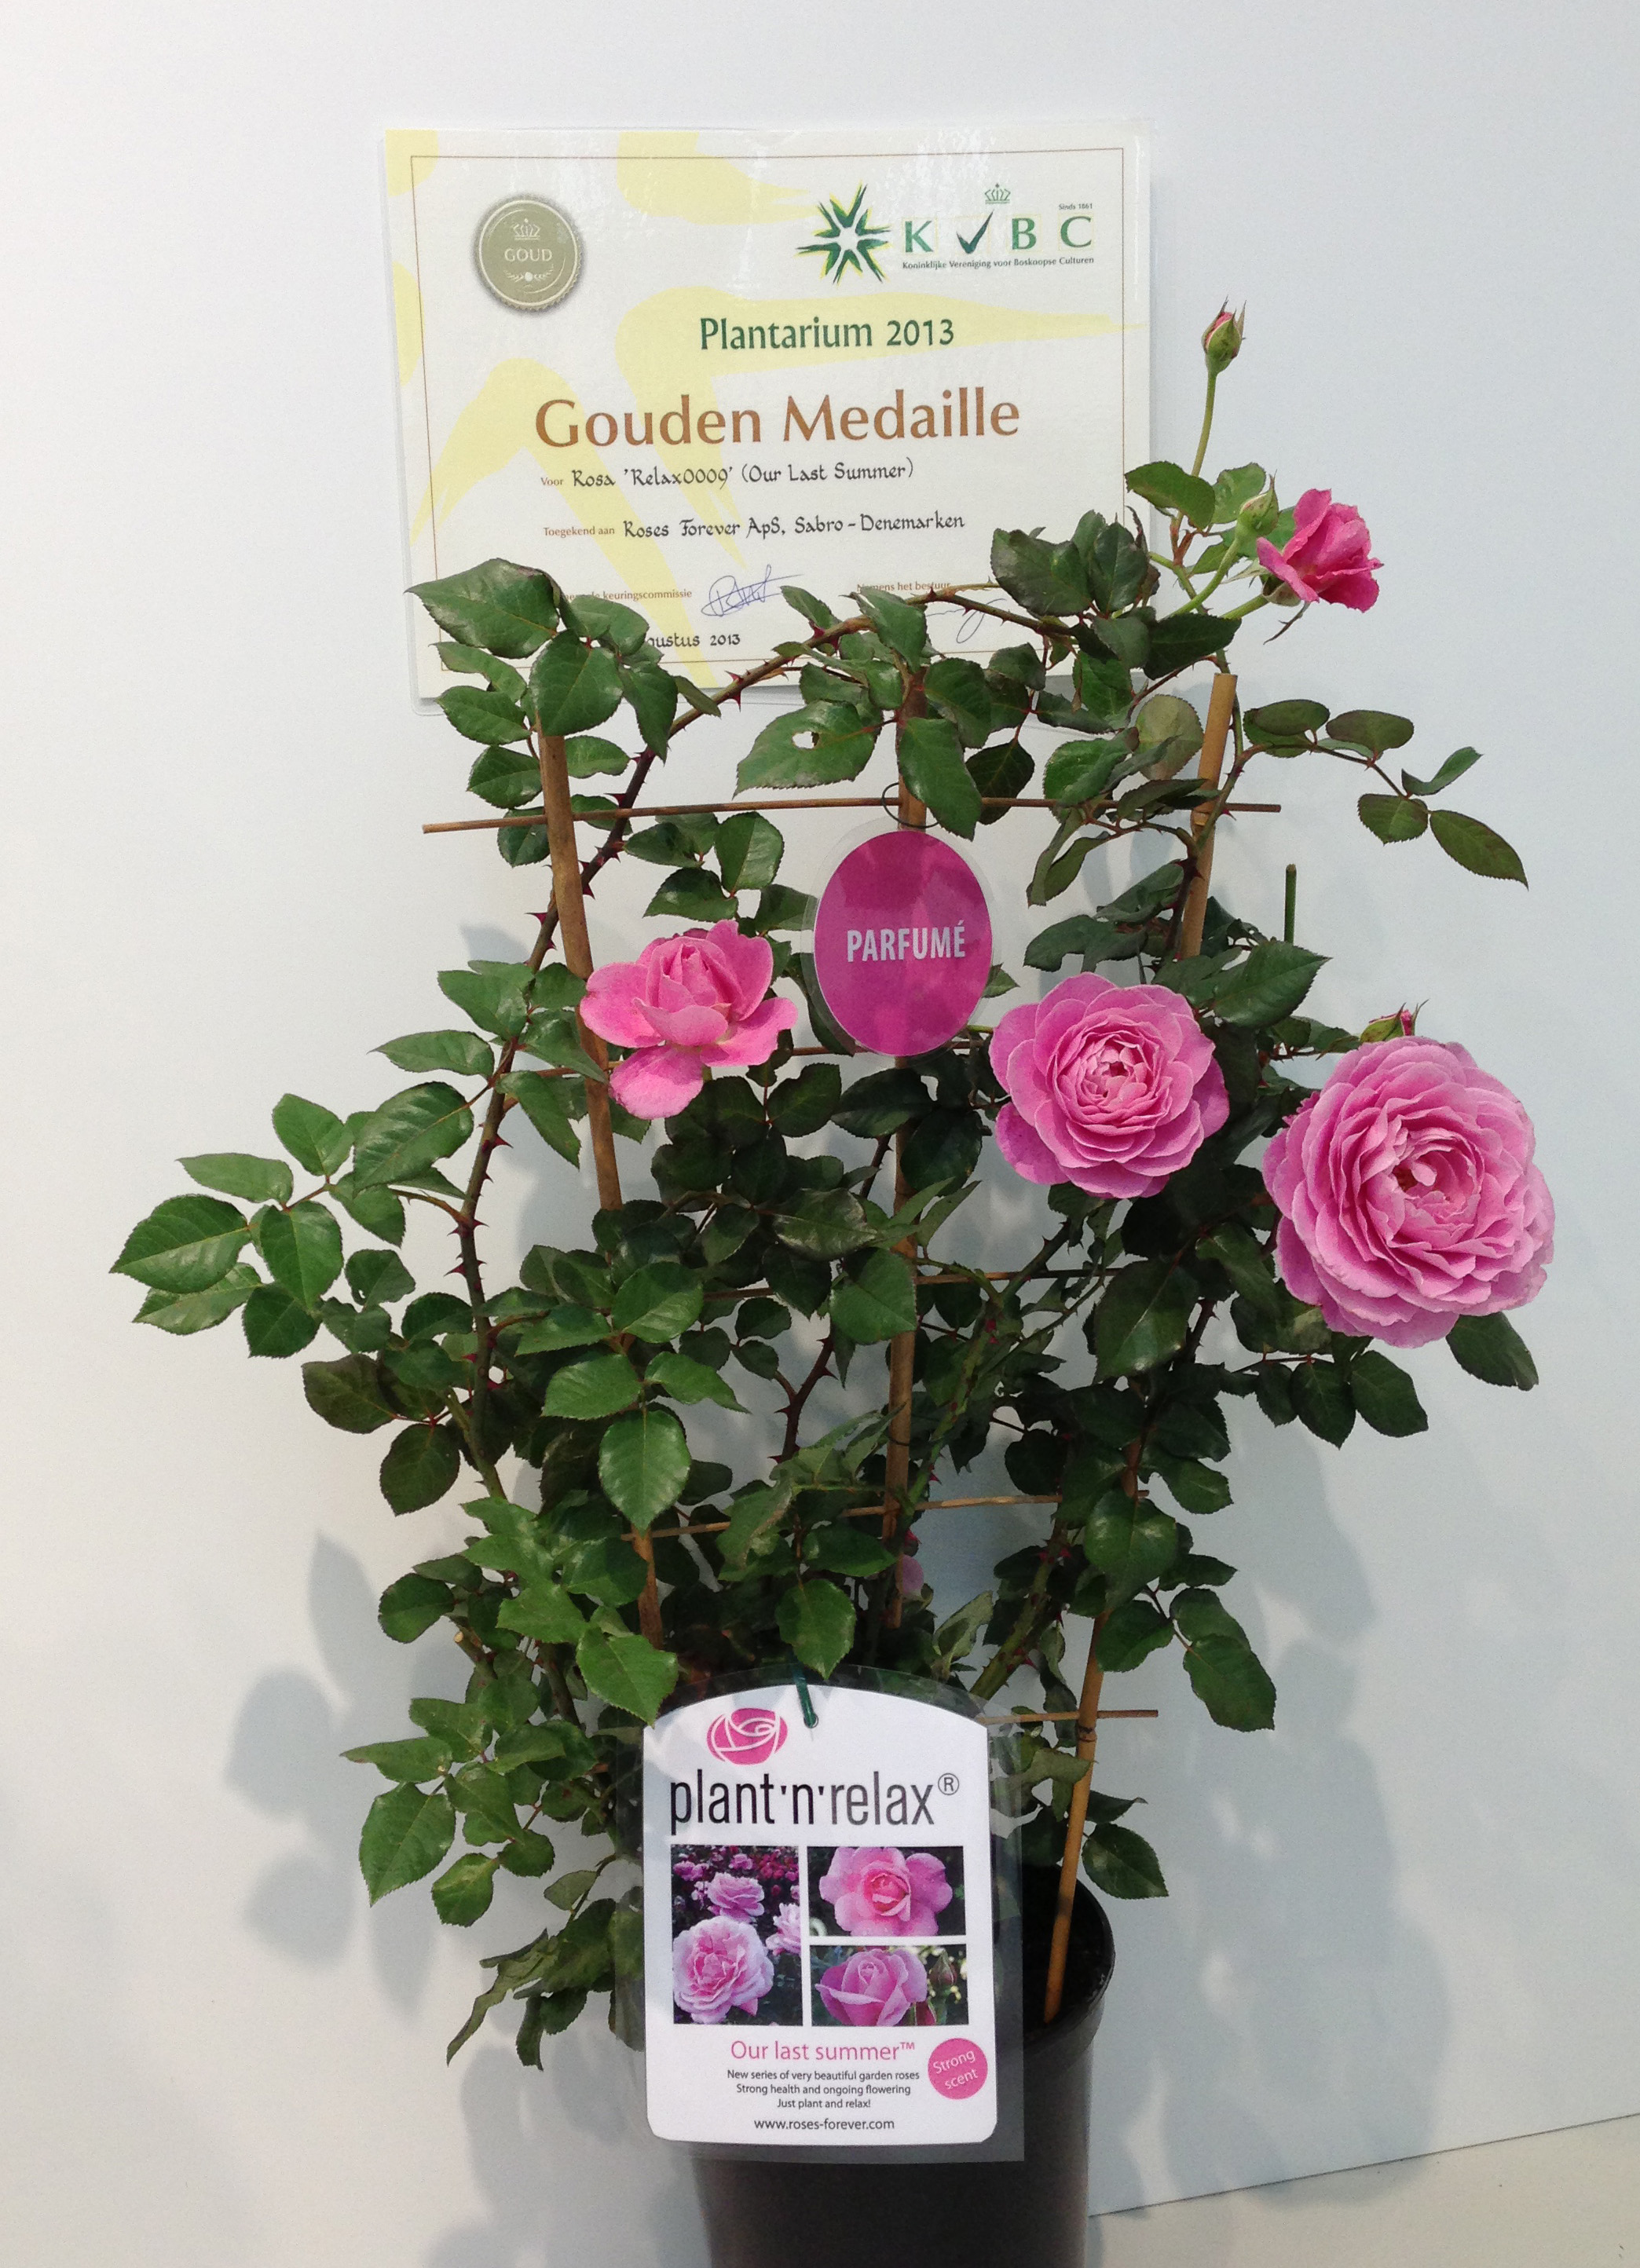 Plantarium, Boskoop, Holland, 2013 - Gold medal